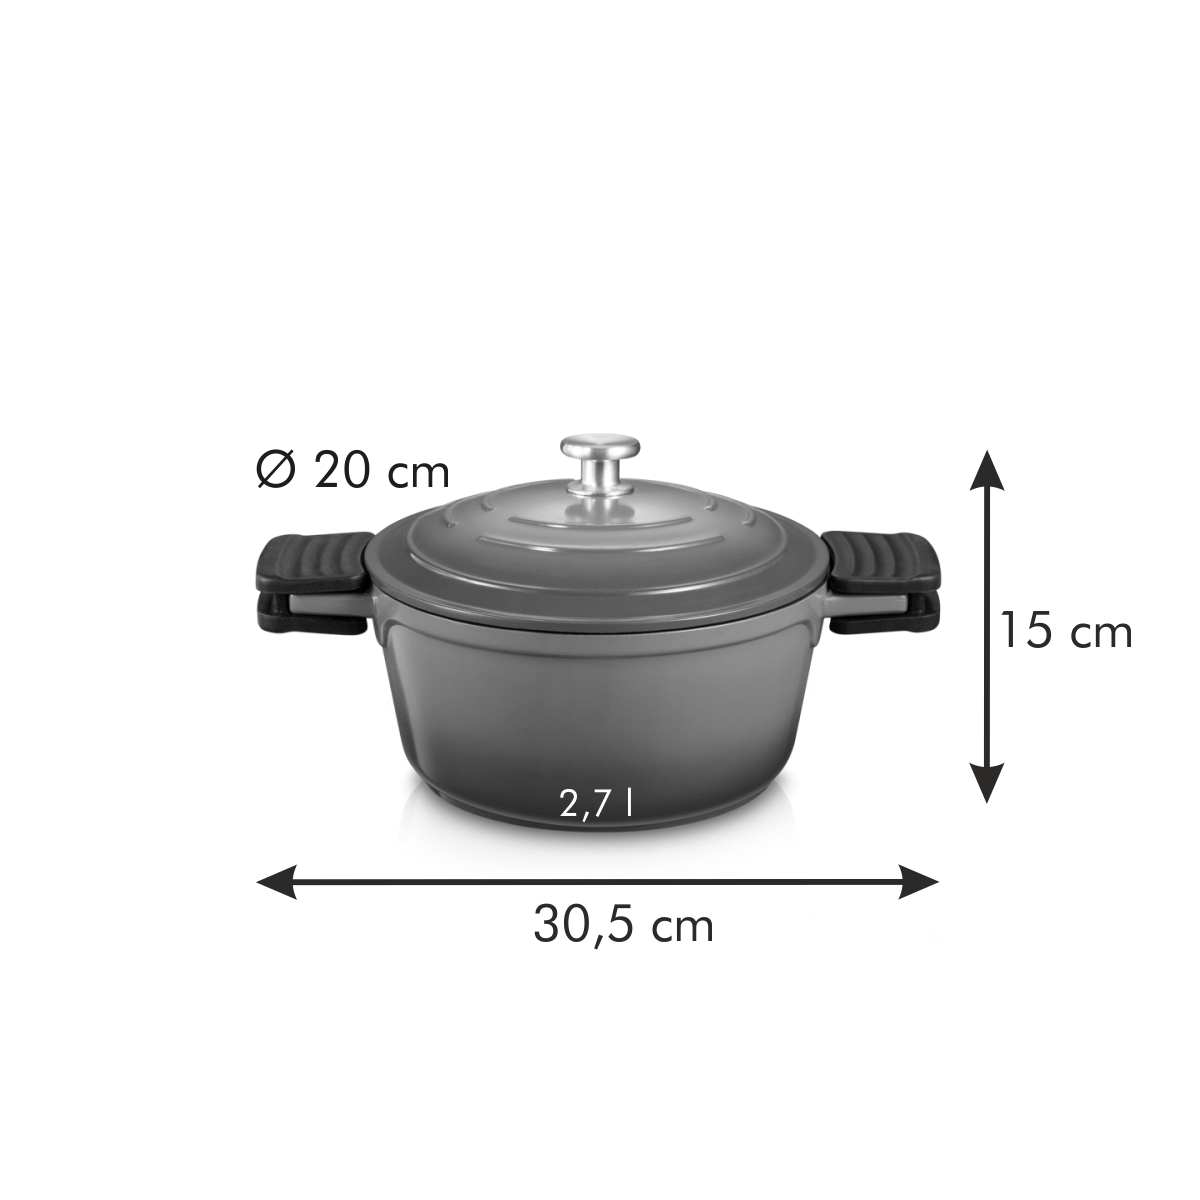 Kastrol s poklicí BORDEAUX ø 20 cm, 2,7 l